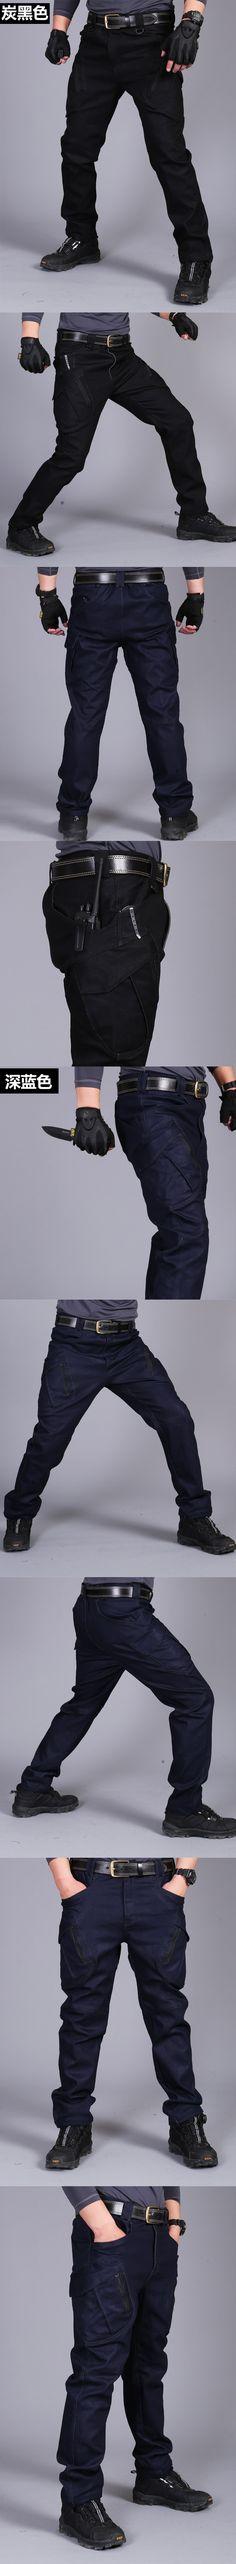 Nuovi Jeans Uomo Pantaloni jogg denim stretch jeans jogg FLEX FREE